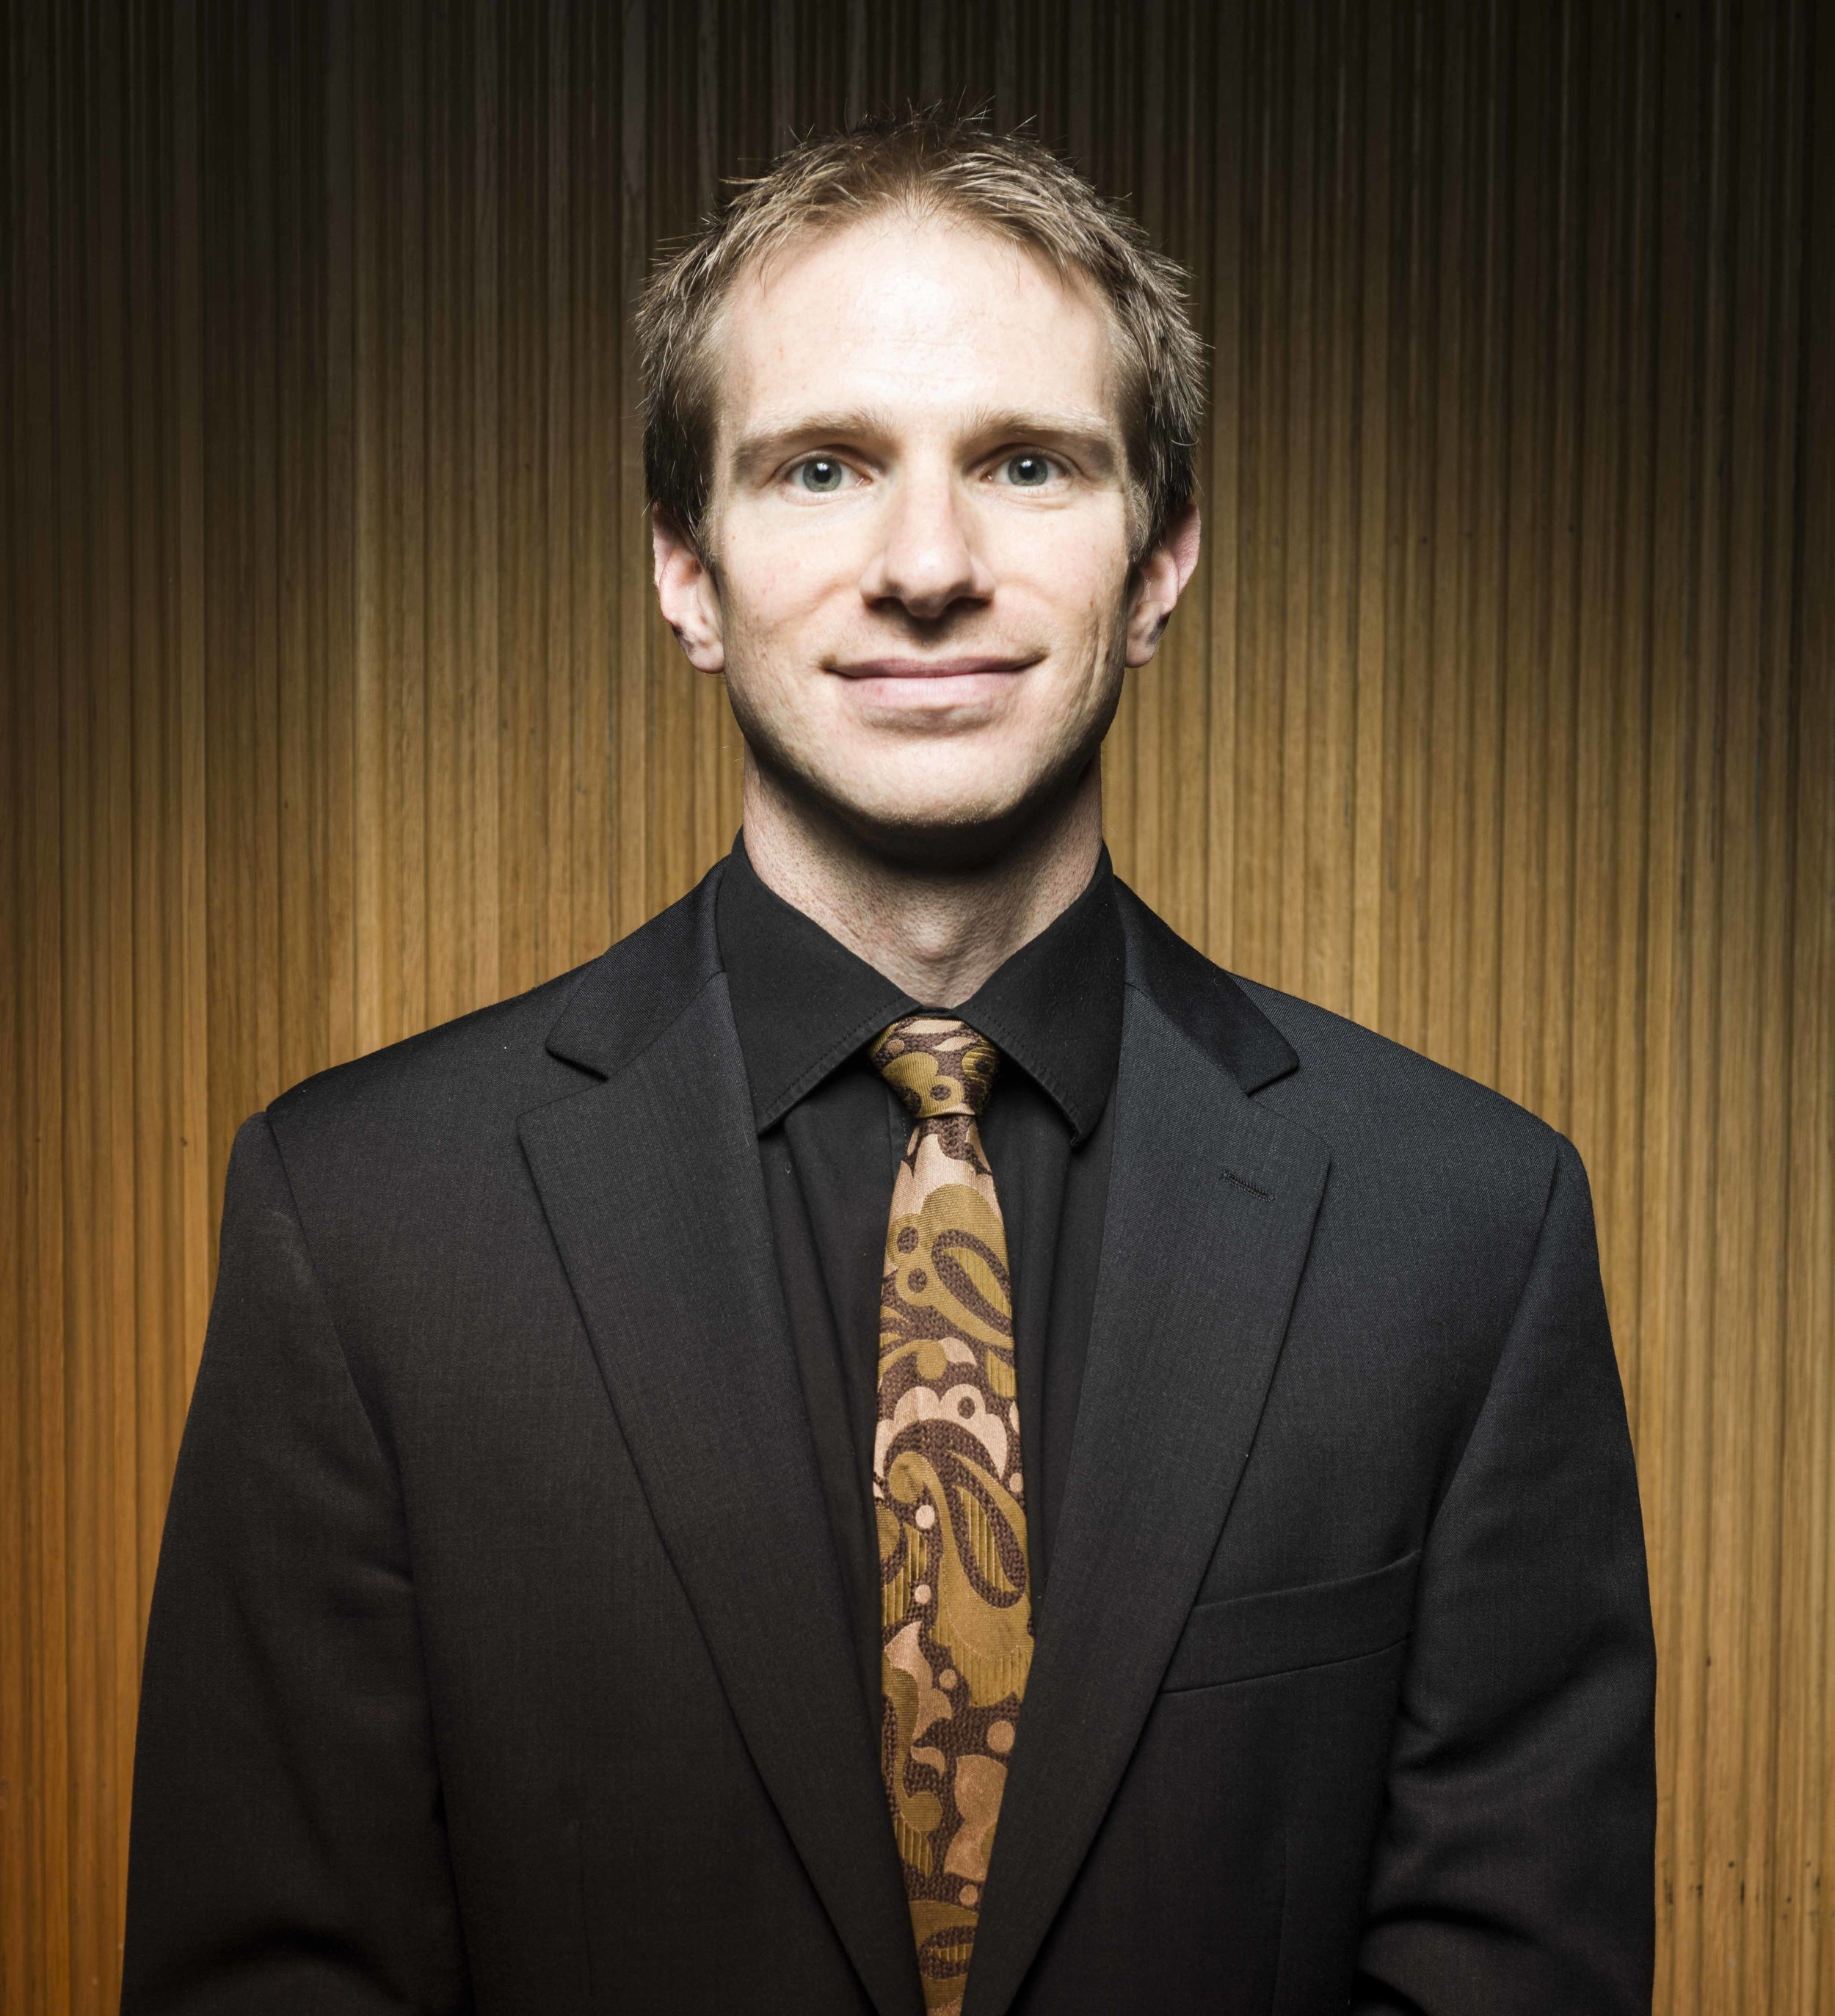 Martin Shultz – Fiolin 2 - Foto: Thor Brødreskift